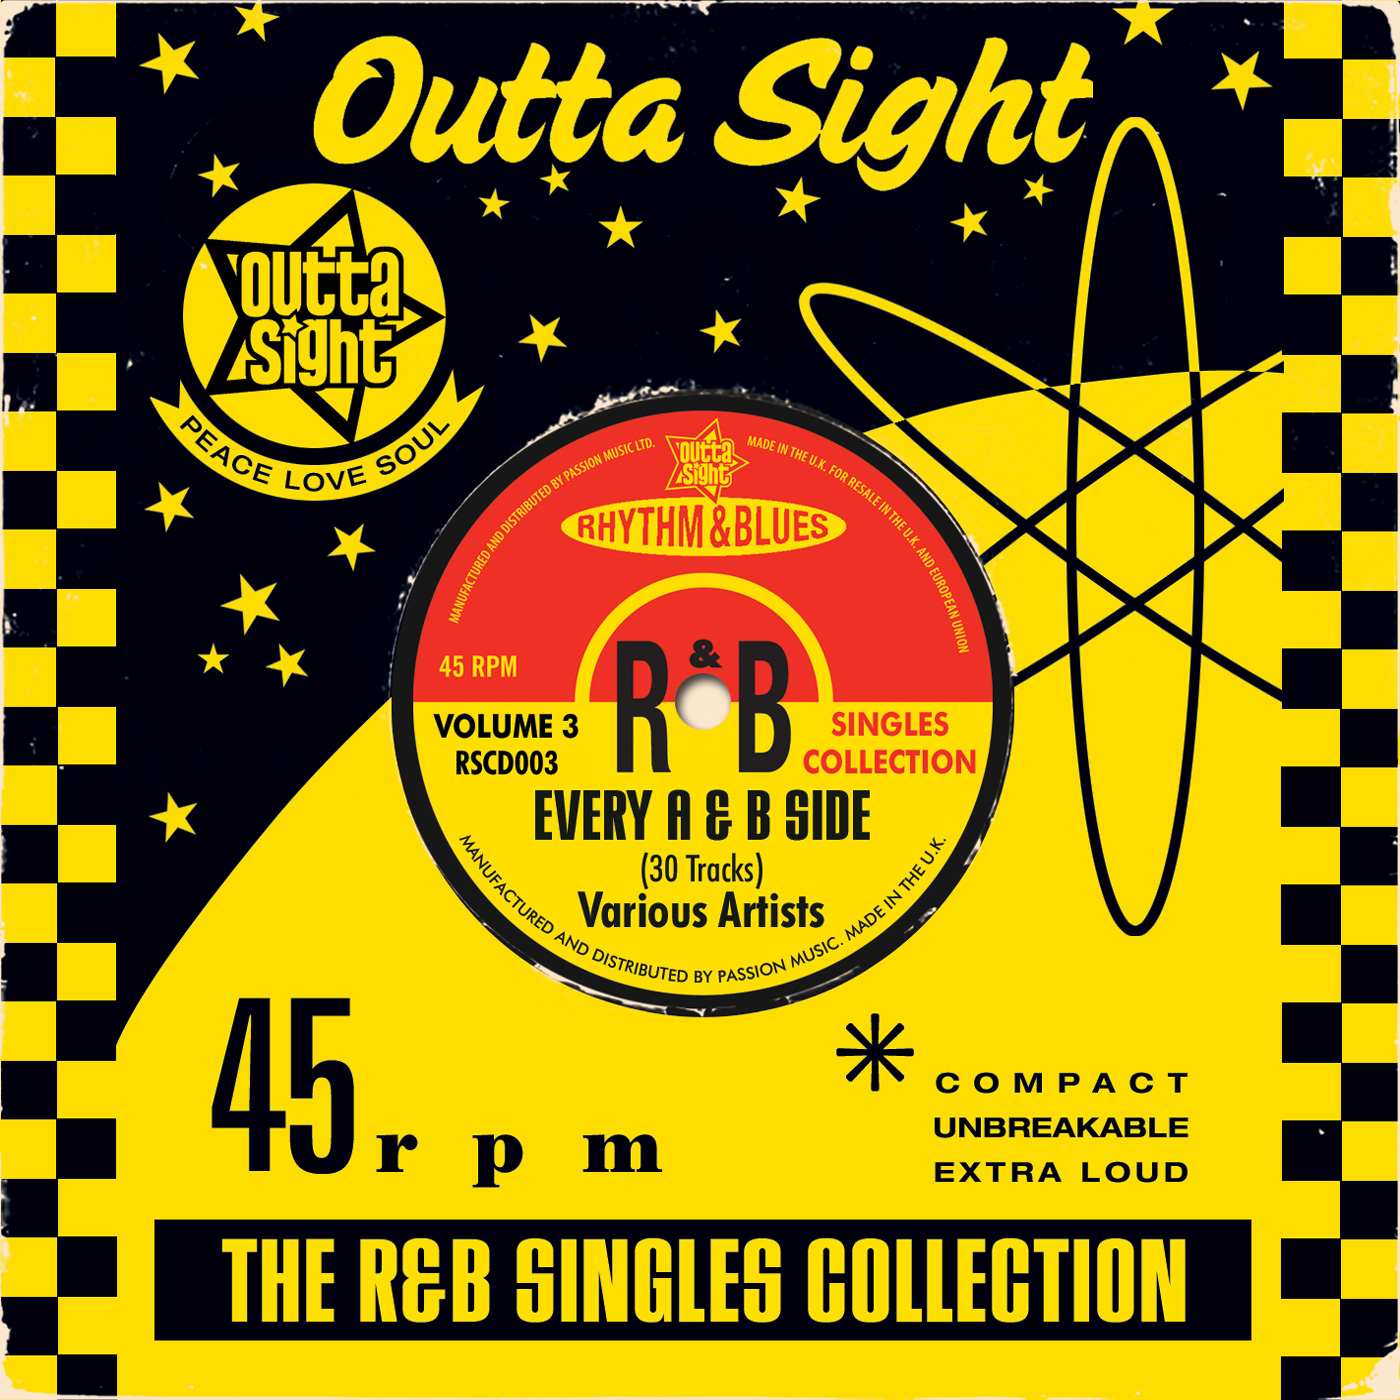 Various/OUTTA SIGHT R&B SINGLES VOL 3 CD